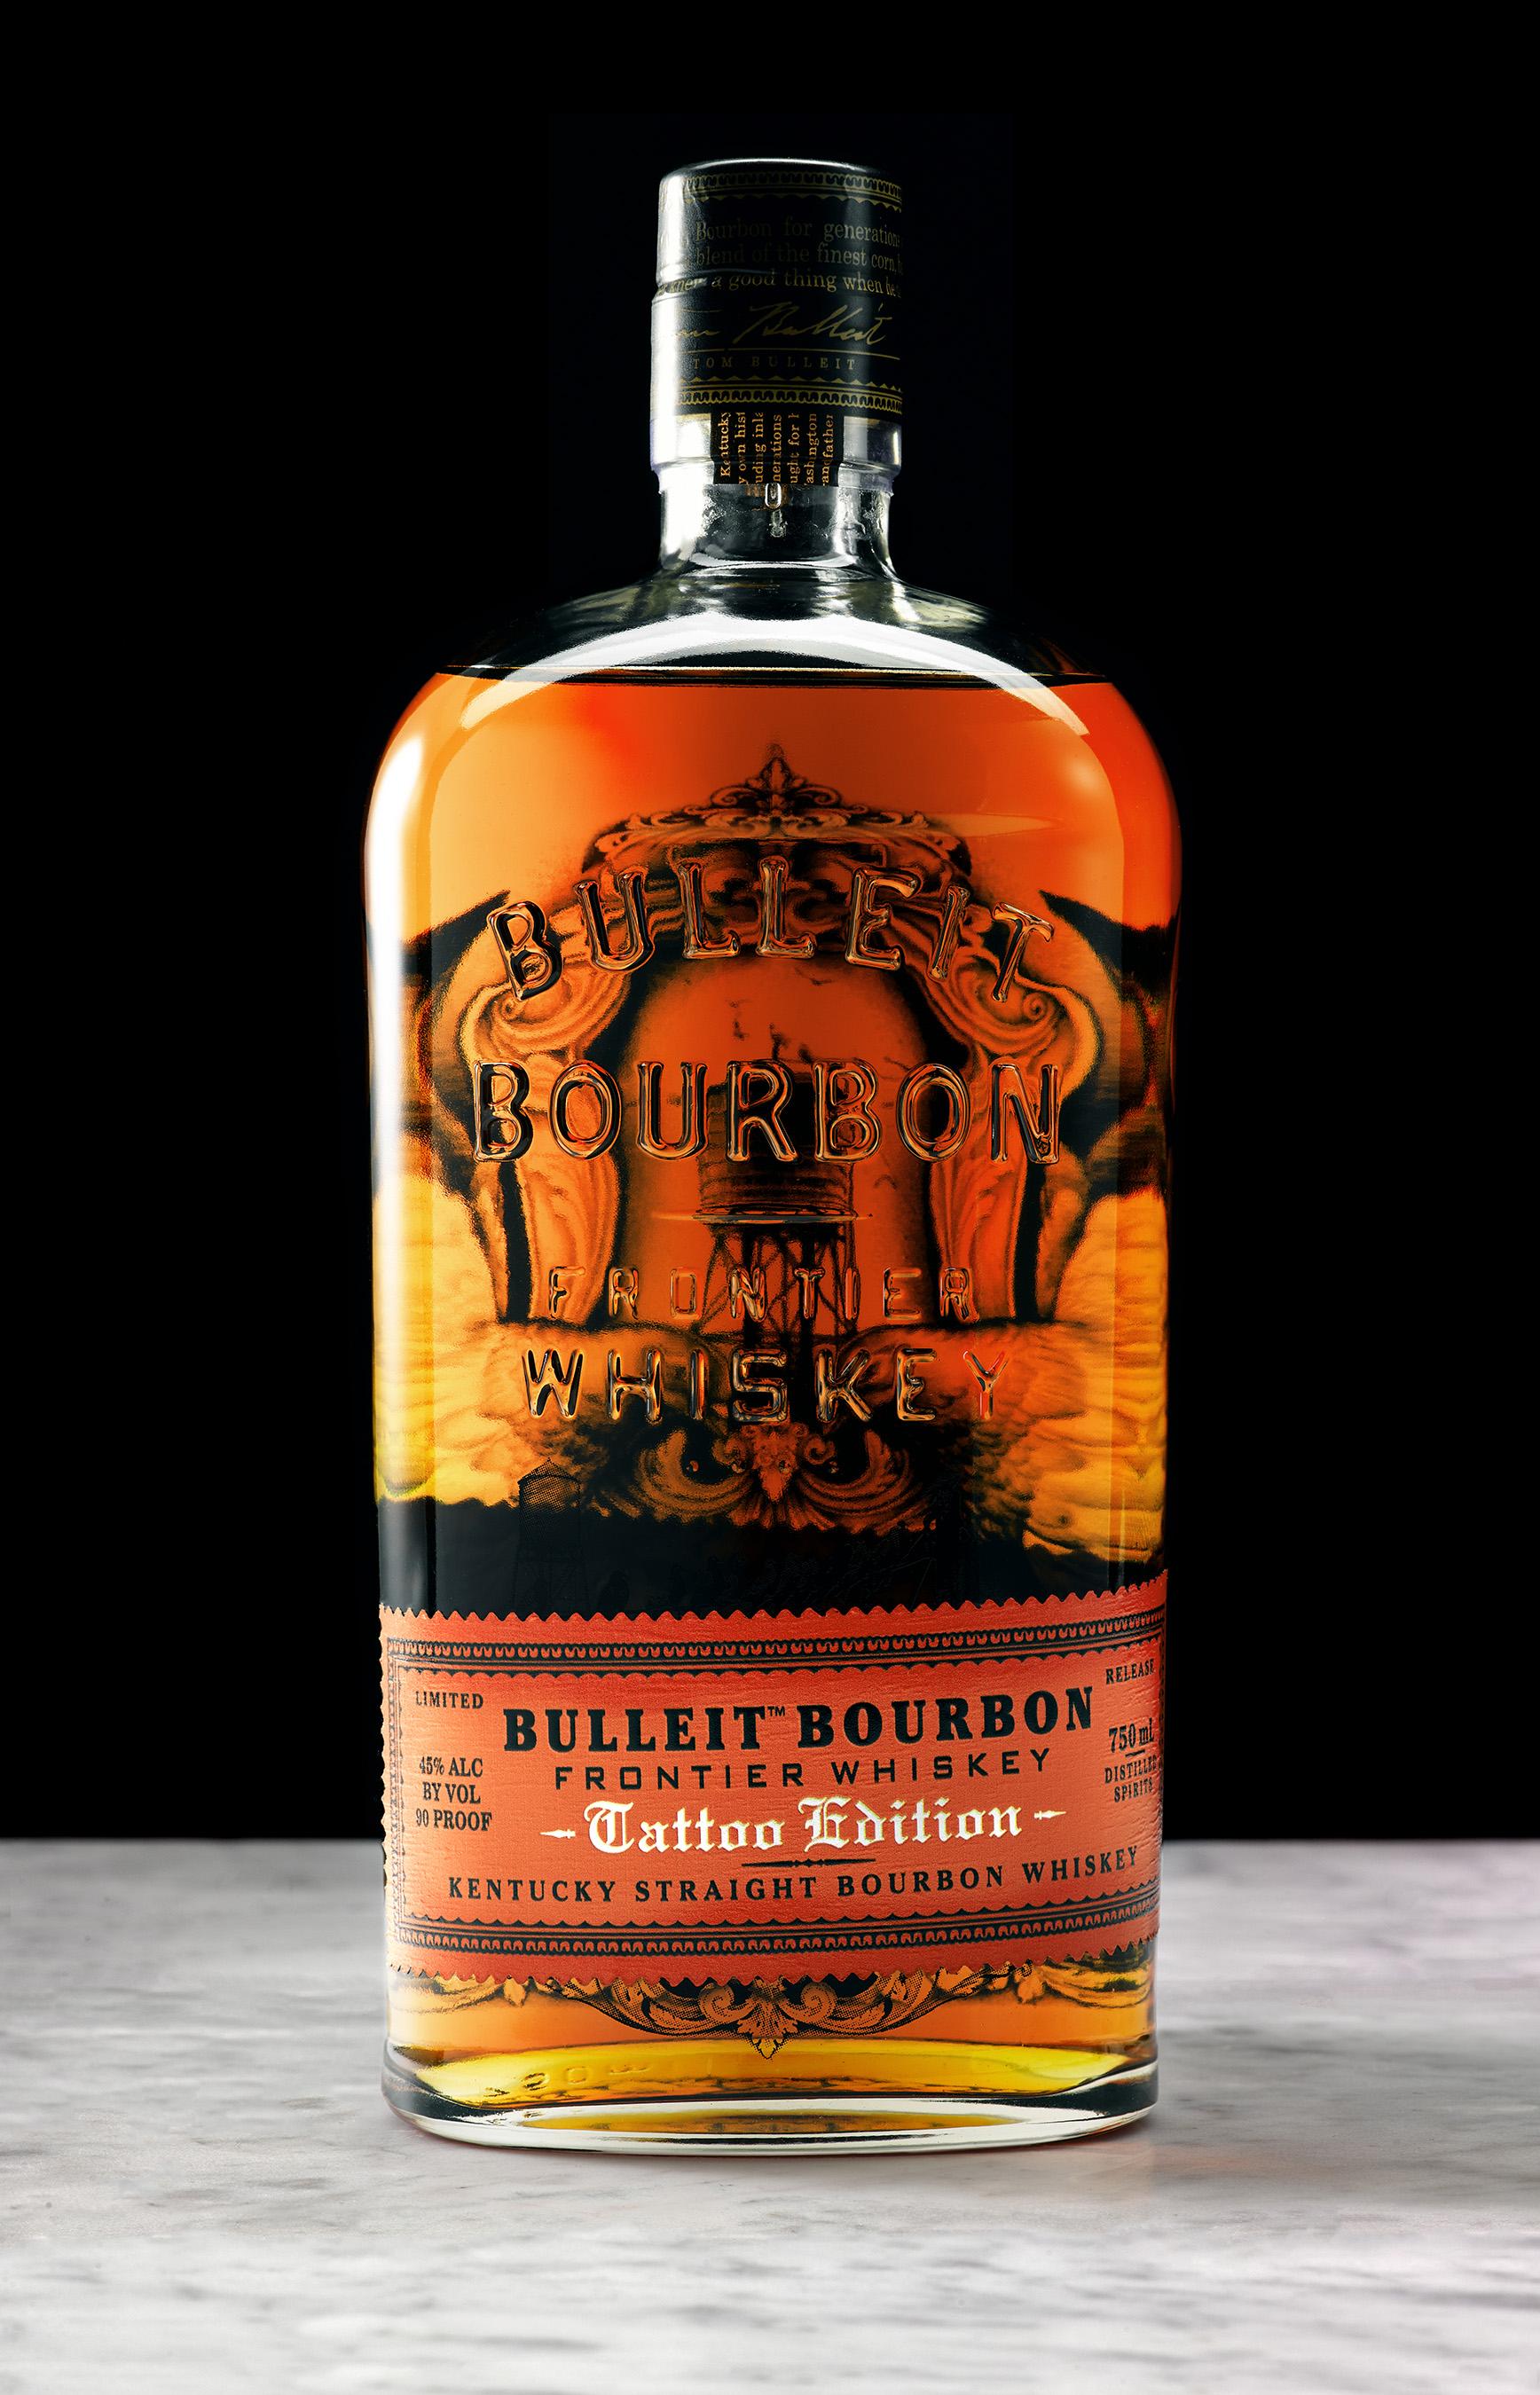 Bulleit Bourbon Tattoo Edition bottle designed by New York tattoo artist Jess Mascetti